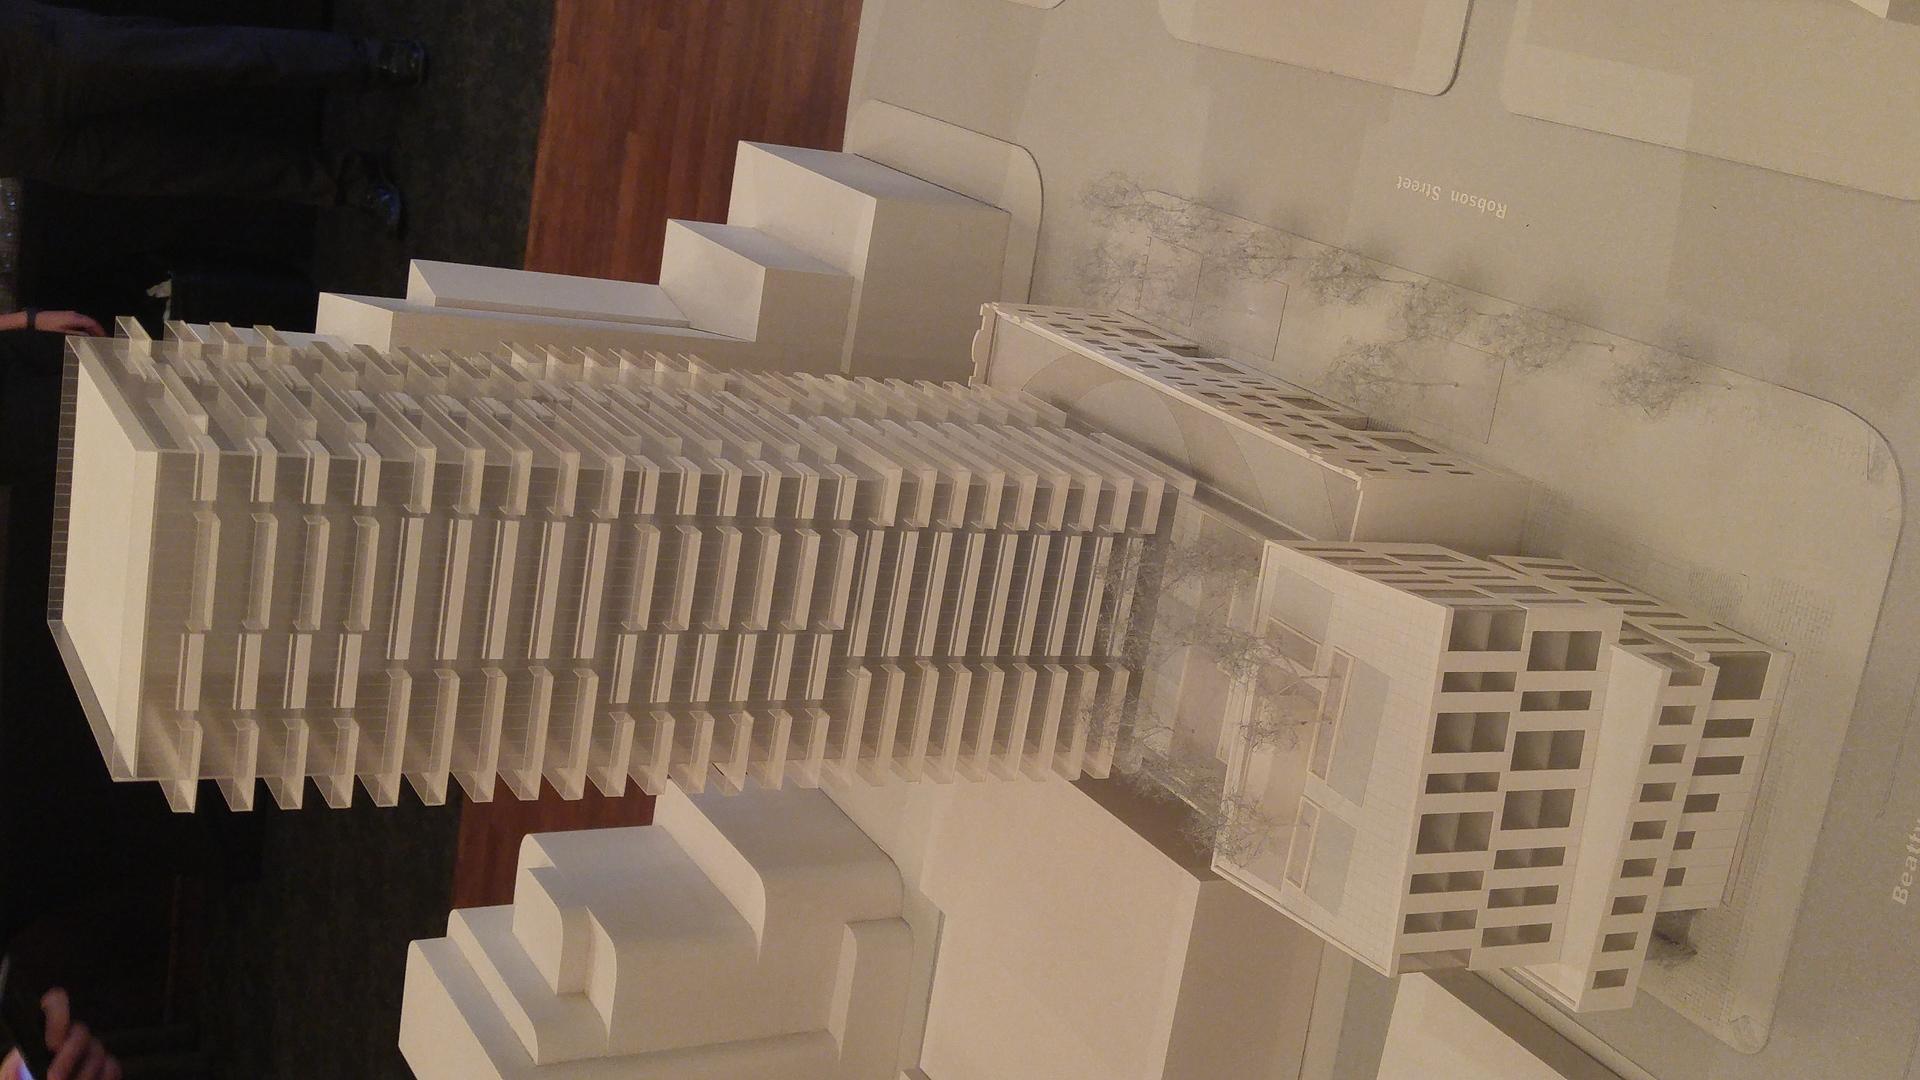 118-robson-east-elevation-of-building-model at BLOCK (118-150 Robson Street, Yaletown, Vancouver West)